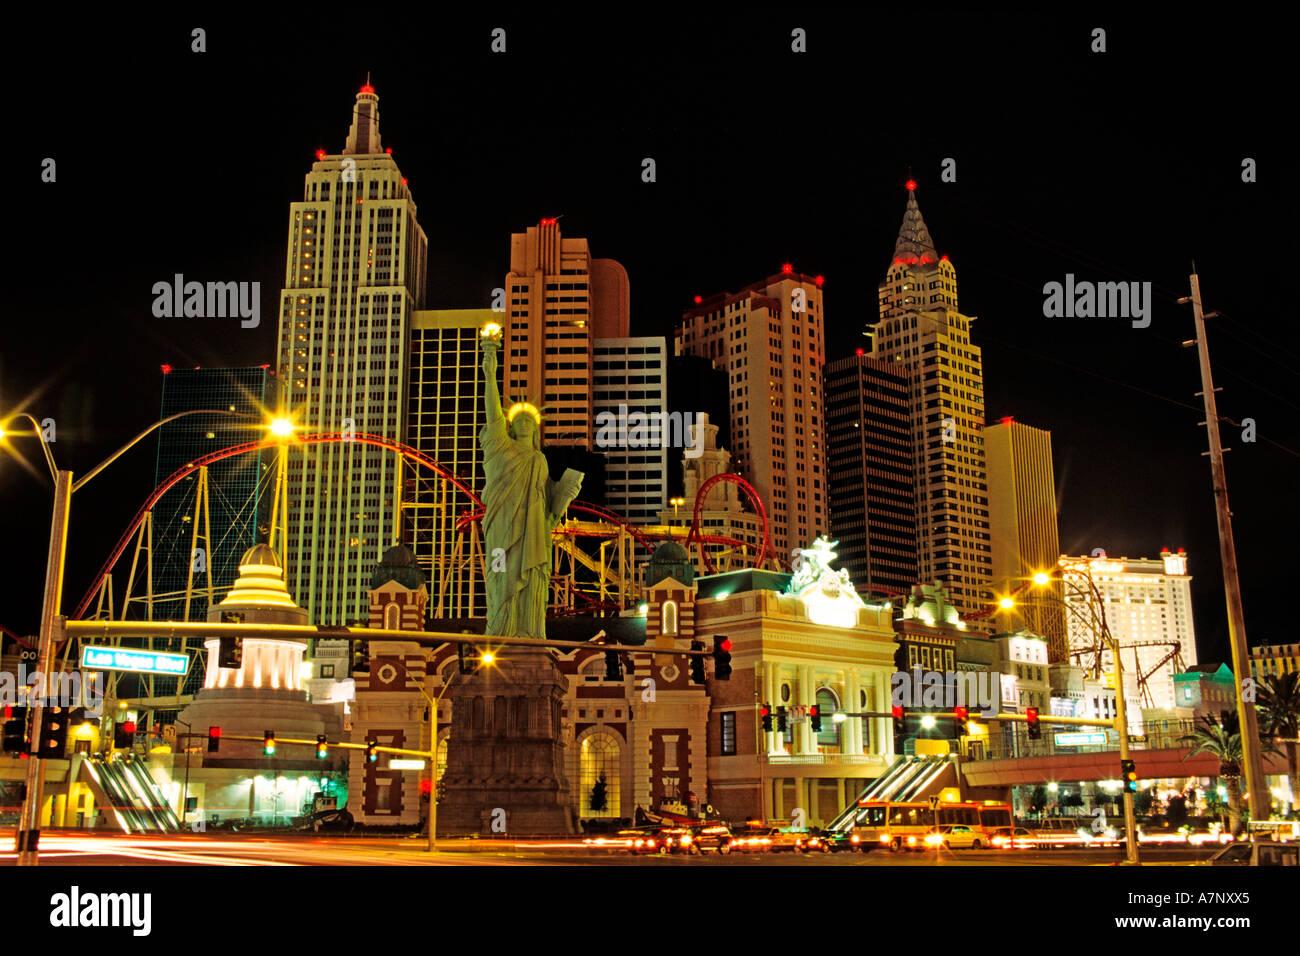 United States, Nevada, Las Vegas city, New York-New York Hotel Casino, inaugurated the January 3rd of 1997 Stock Photo